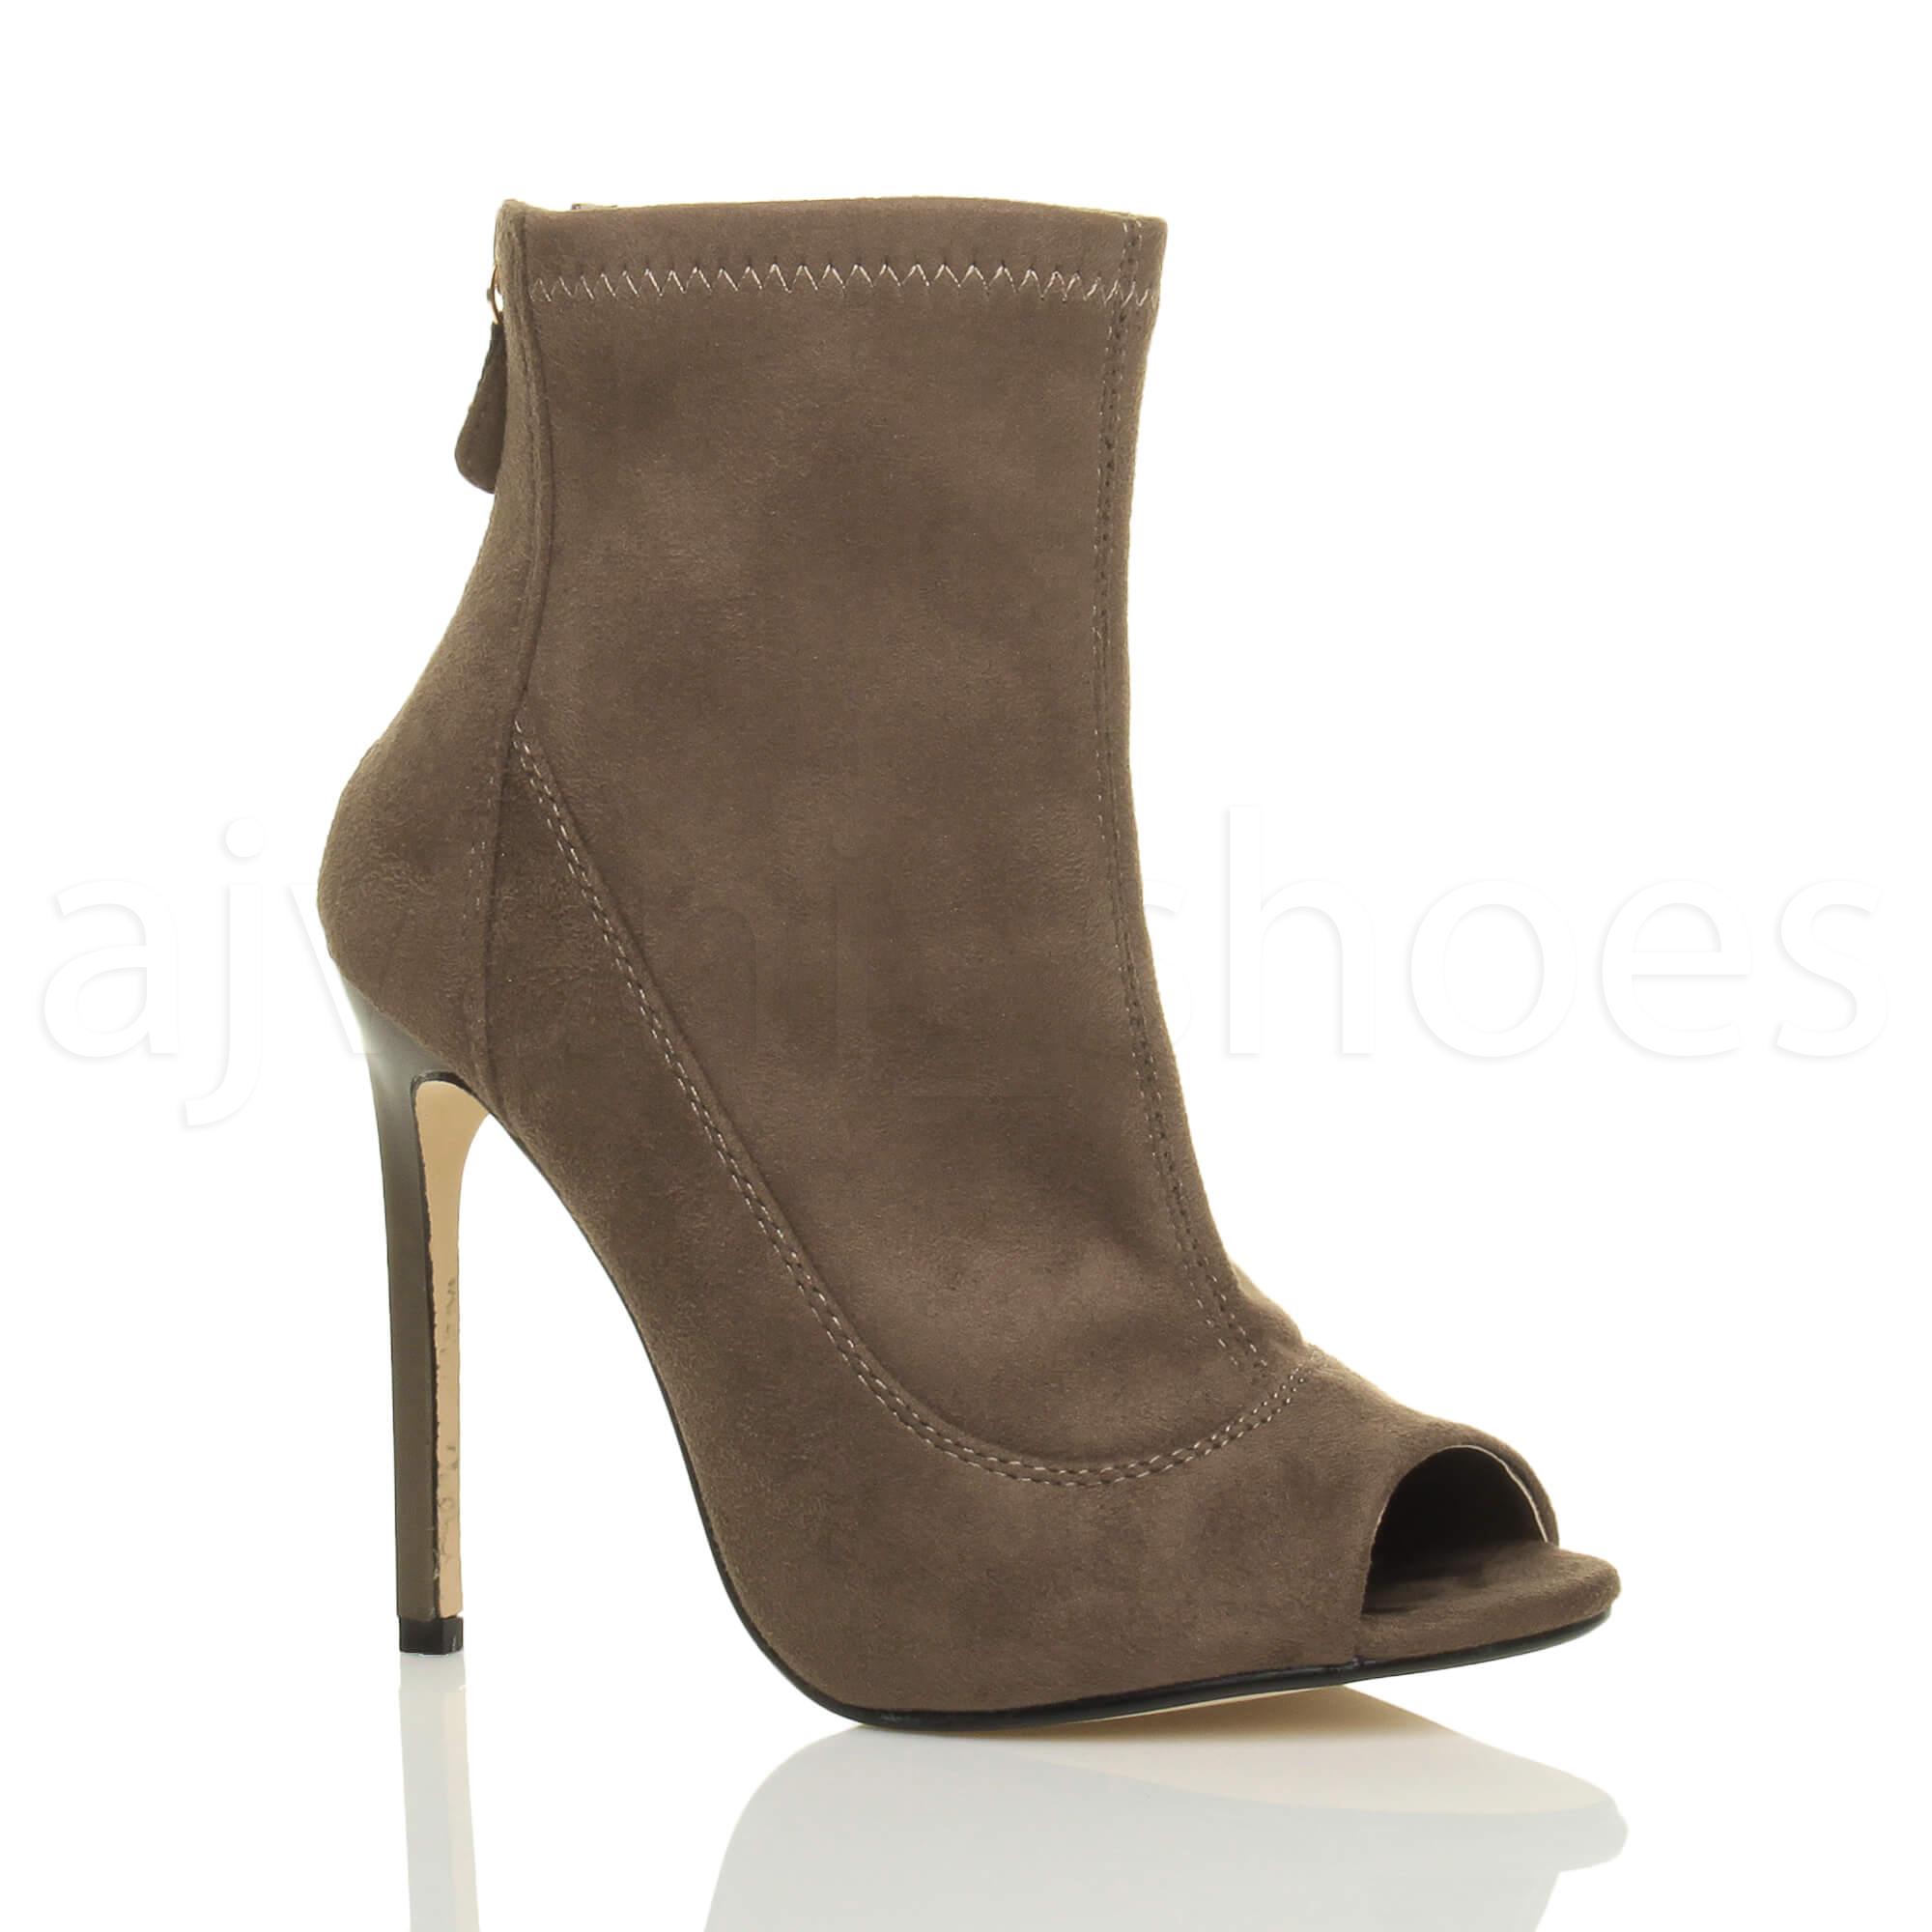 Damen Hohe Stiletto-Bbsatz Peep Toe Reißverschluss Stiefeletten Sandalen Größe